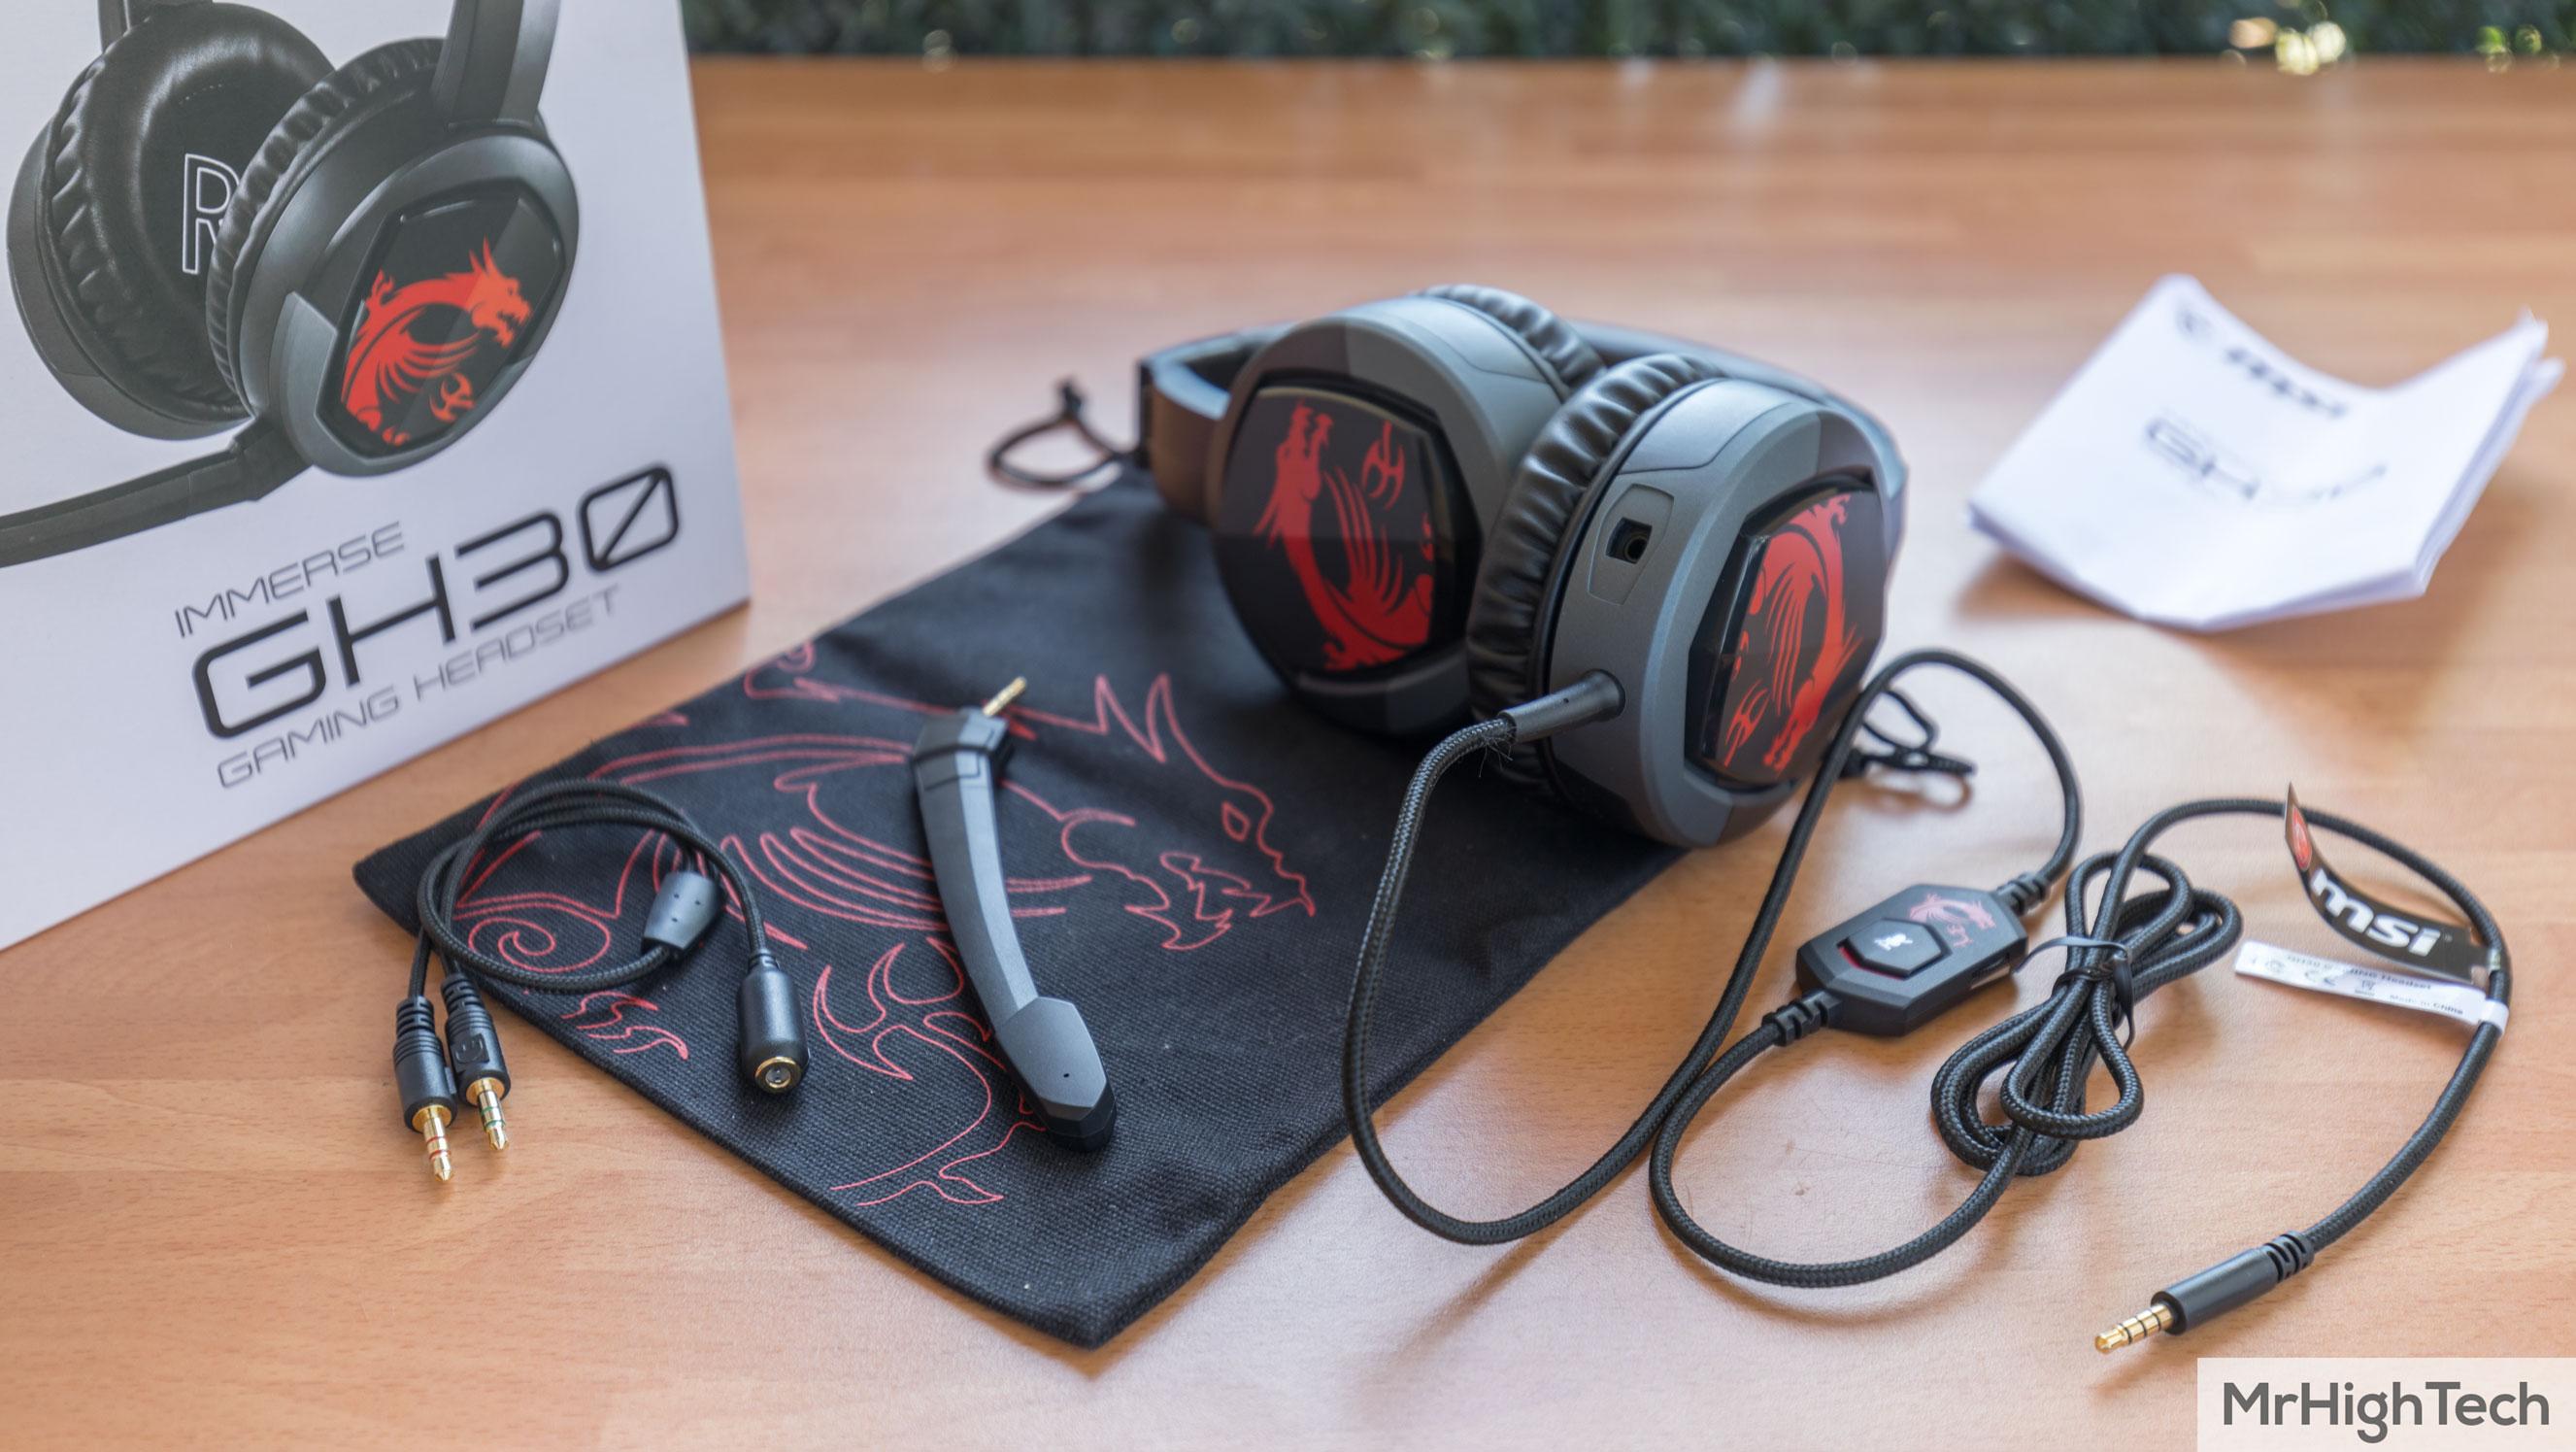 MSI Immerse GH30 : Test du casque gamer nomade et Avis complet